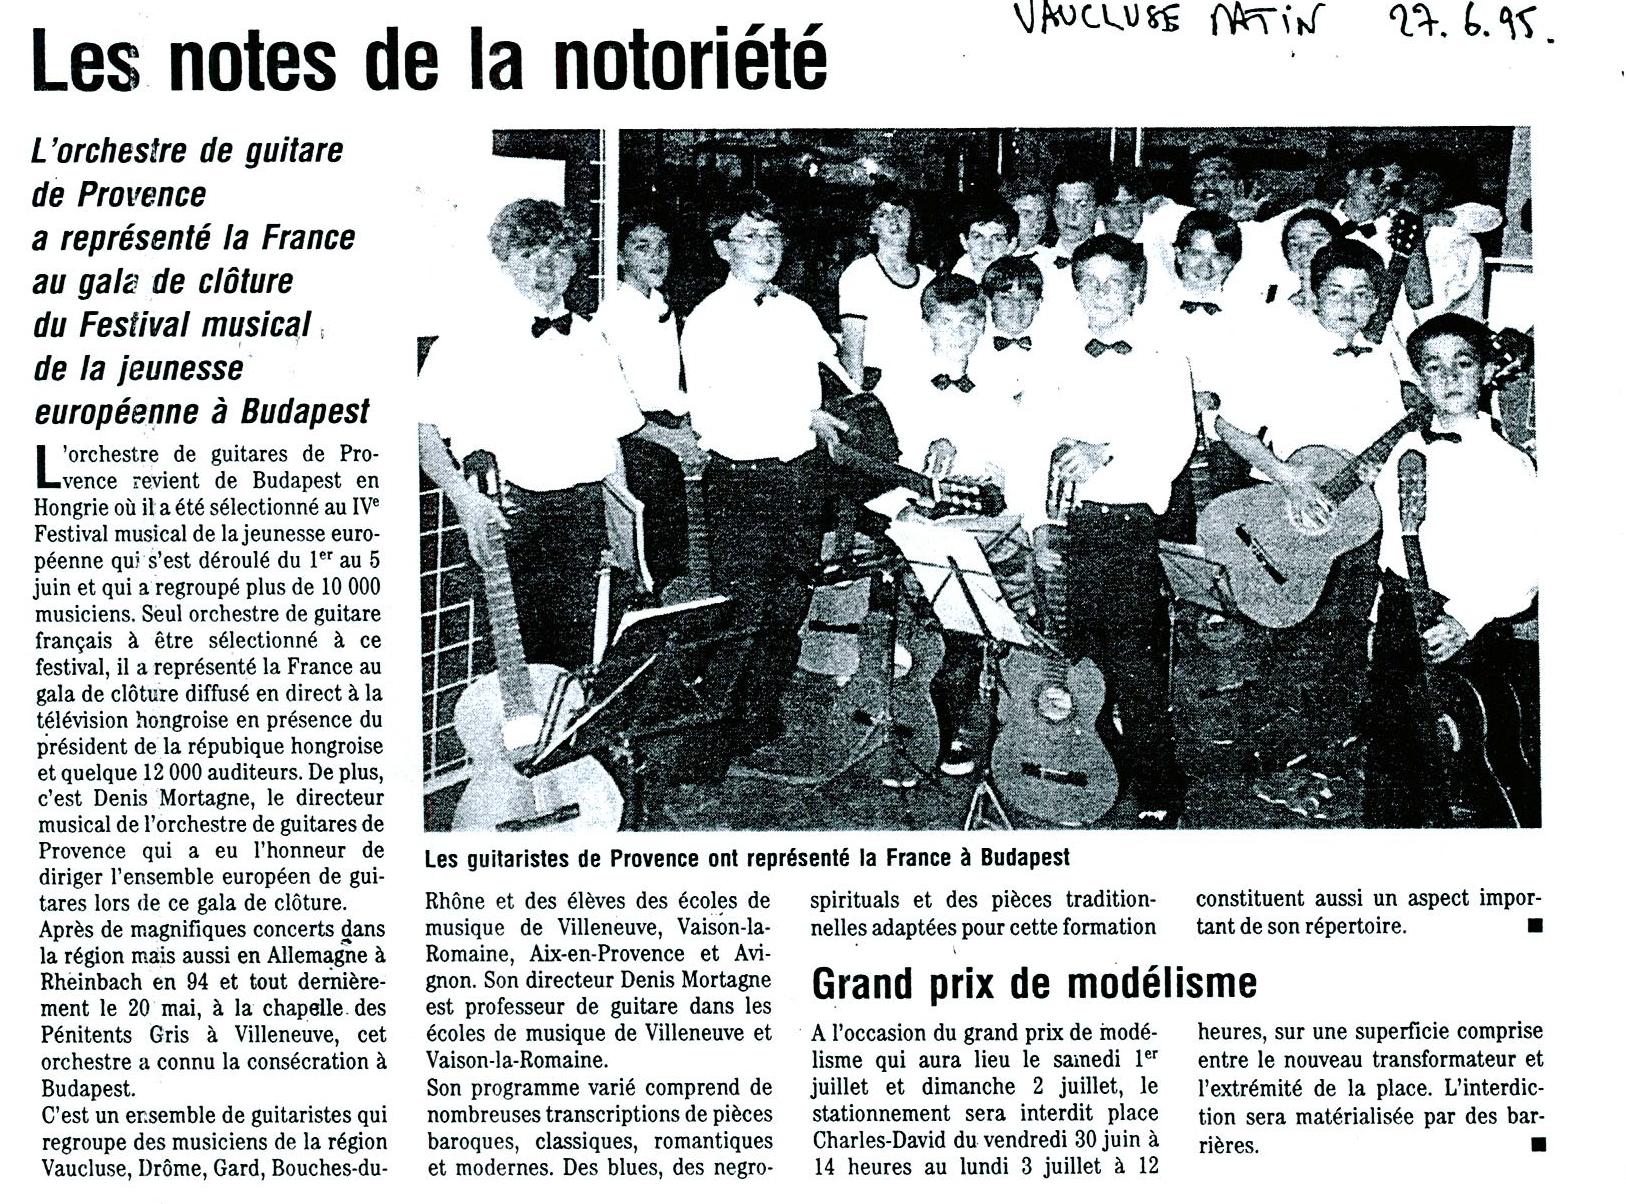 19950627-vaucluse-matin-budapest